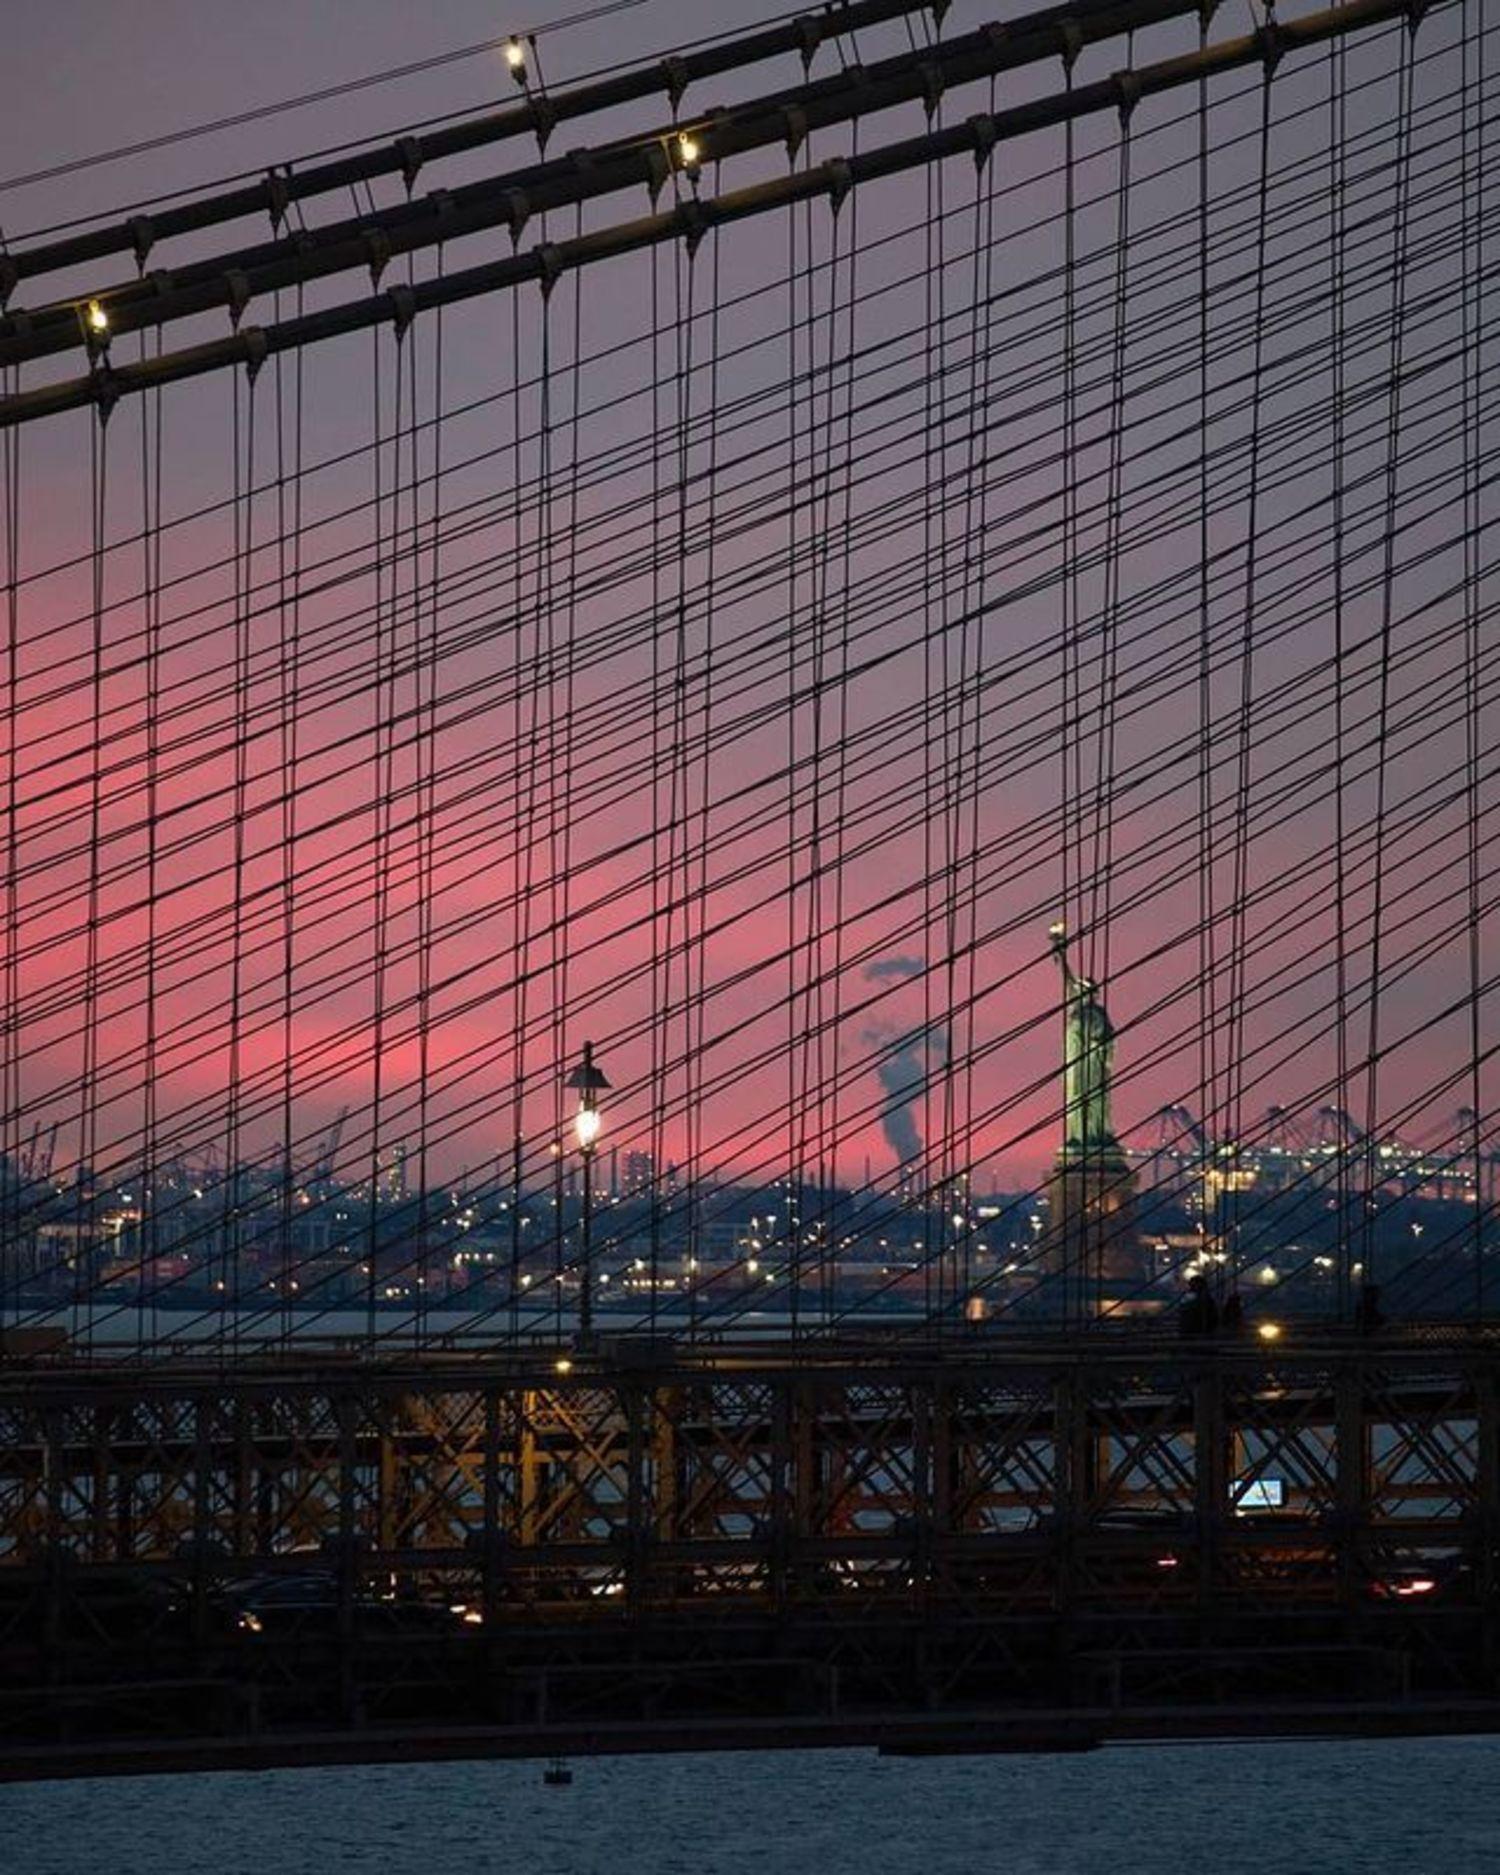 Sunset through the Brooklyn Bridge Cables, New York